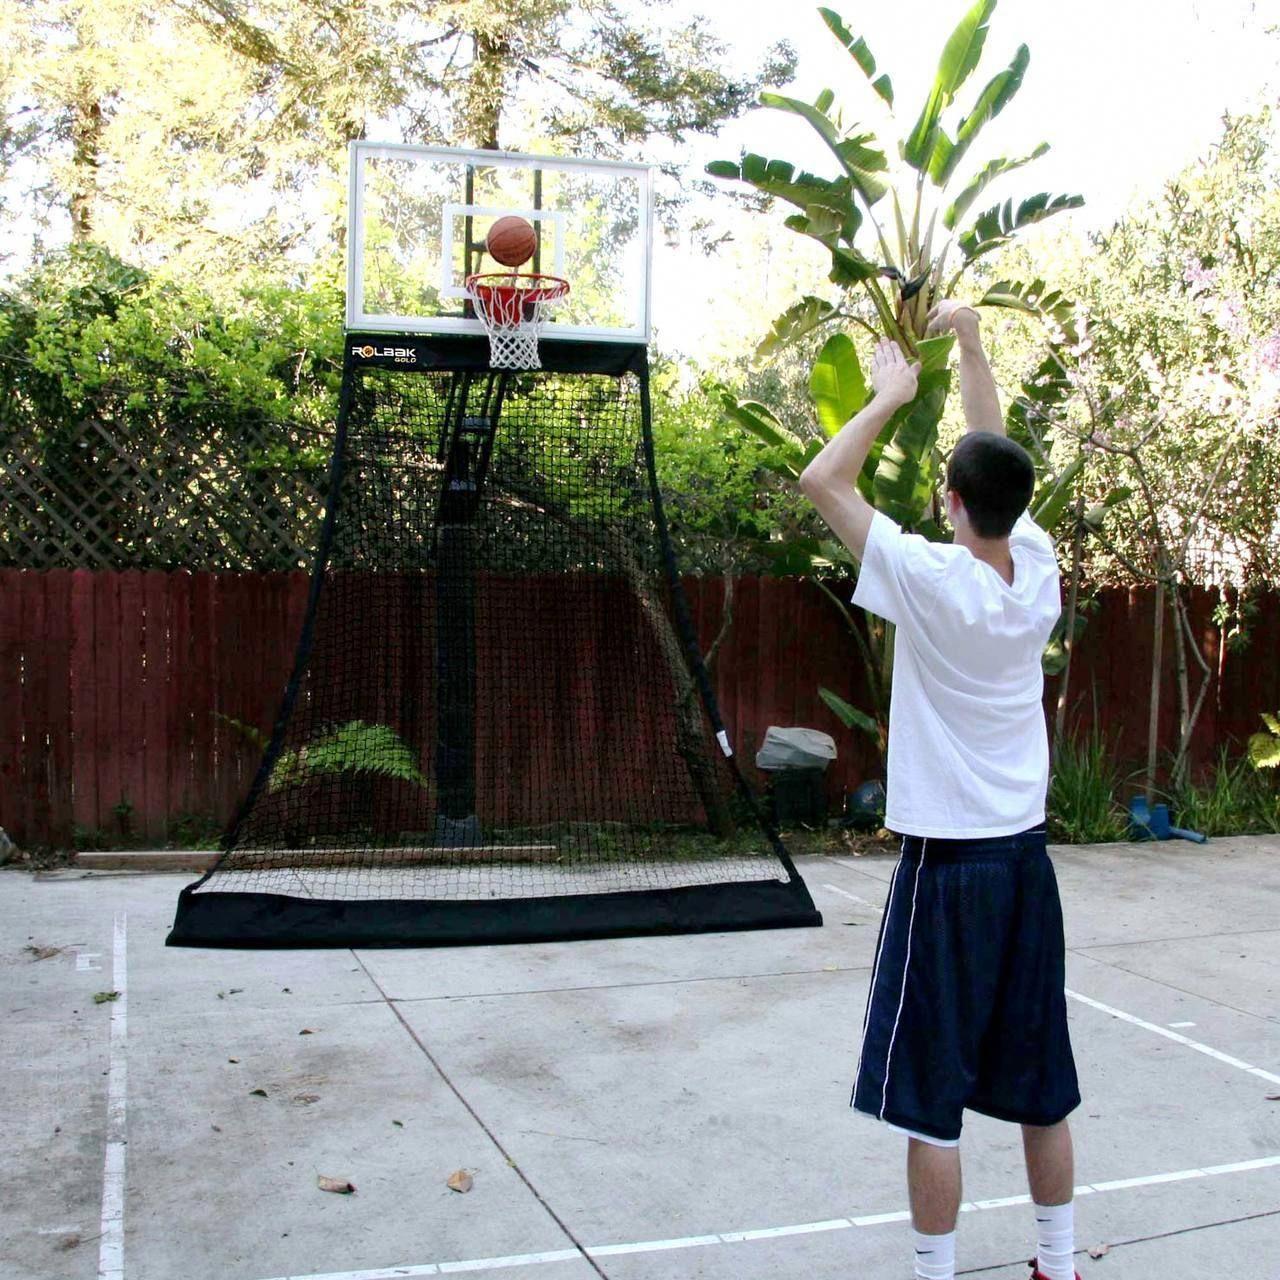 Basketball Court Dimensions Cheapestbasketballuniforms